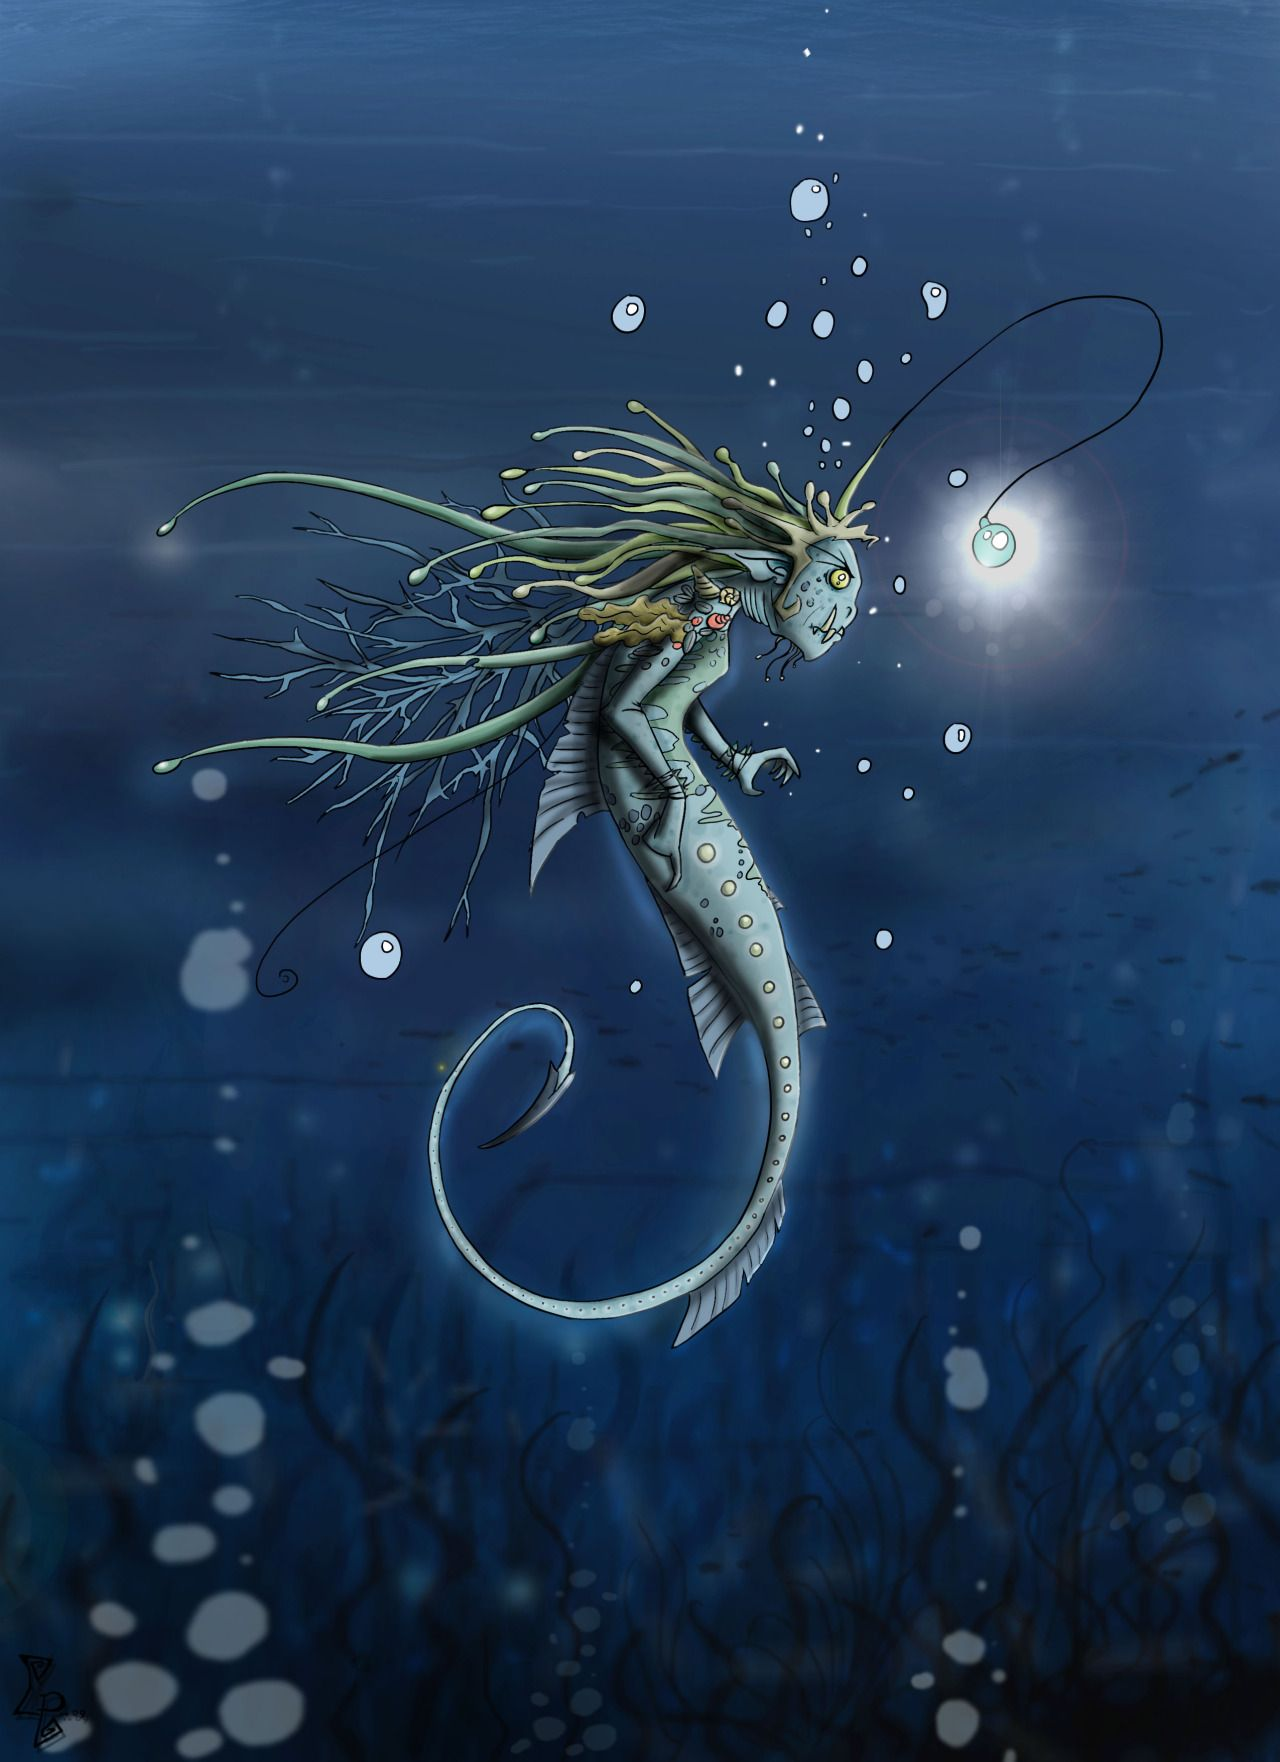 The Art Of Animation, Clv. Angler Fish Mermaid ...